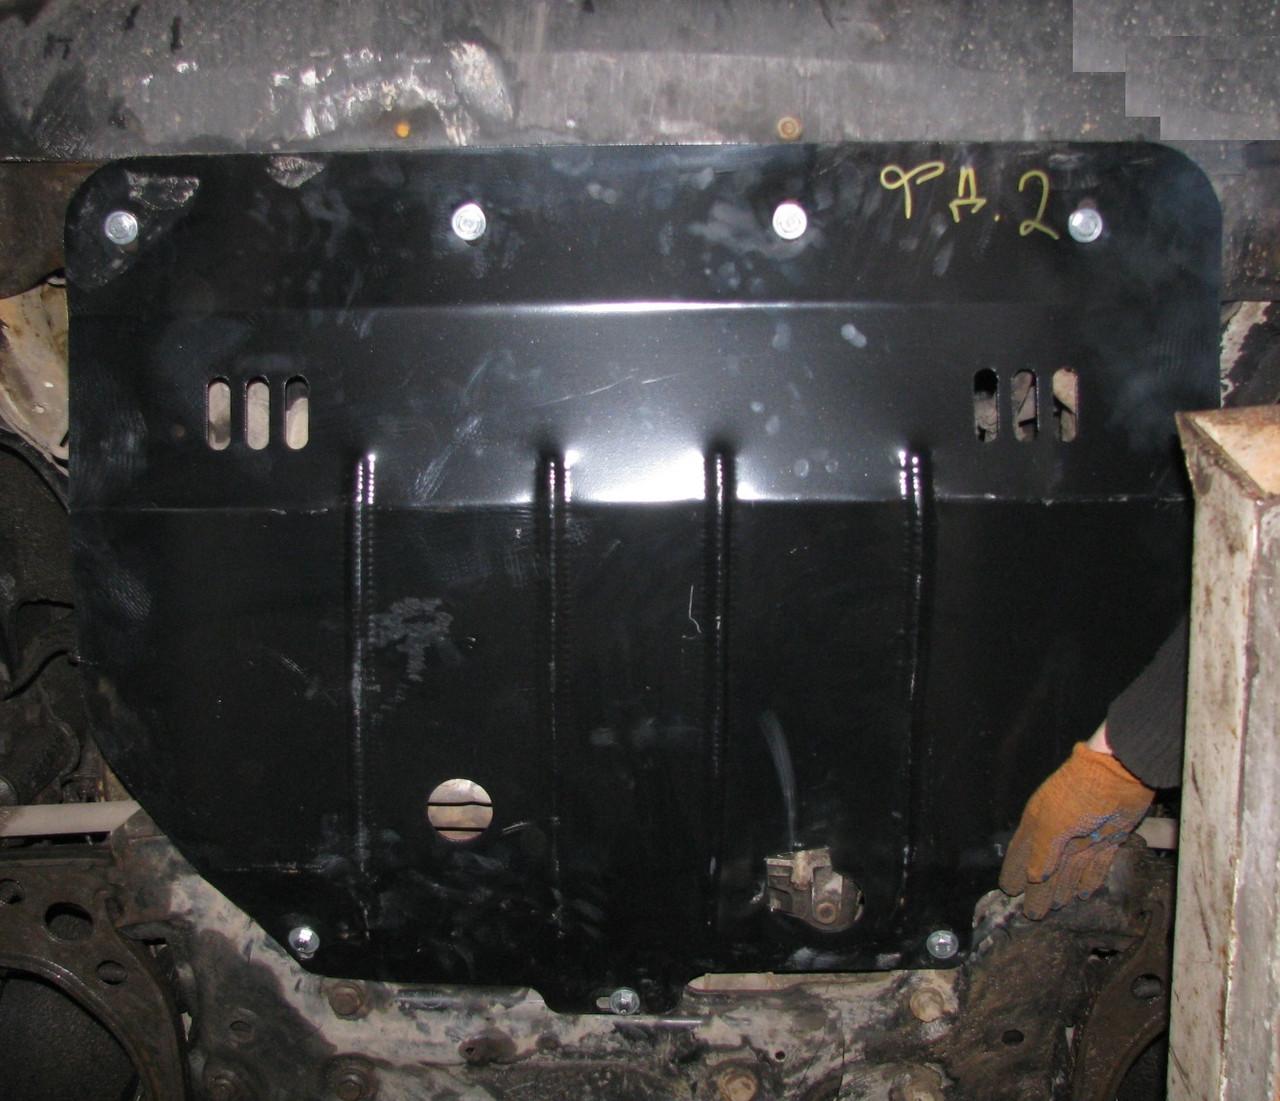 Захист двигуна Citroen JUMPER 1995-2006 МКПП/АКПП Всі двигуни окрім 2.5D (двигун+КПП)